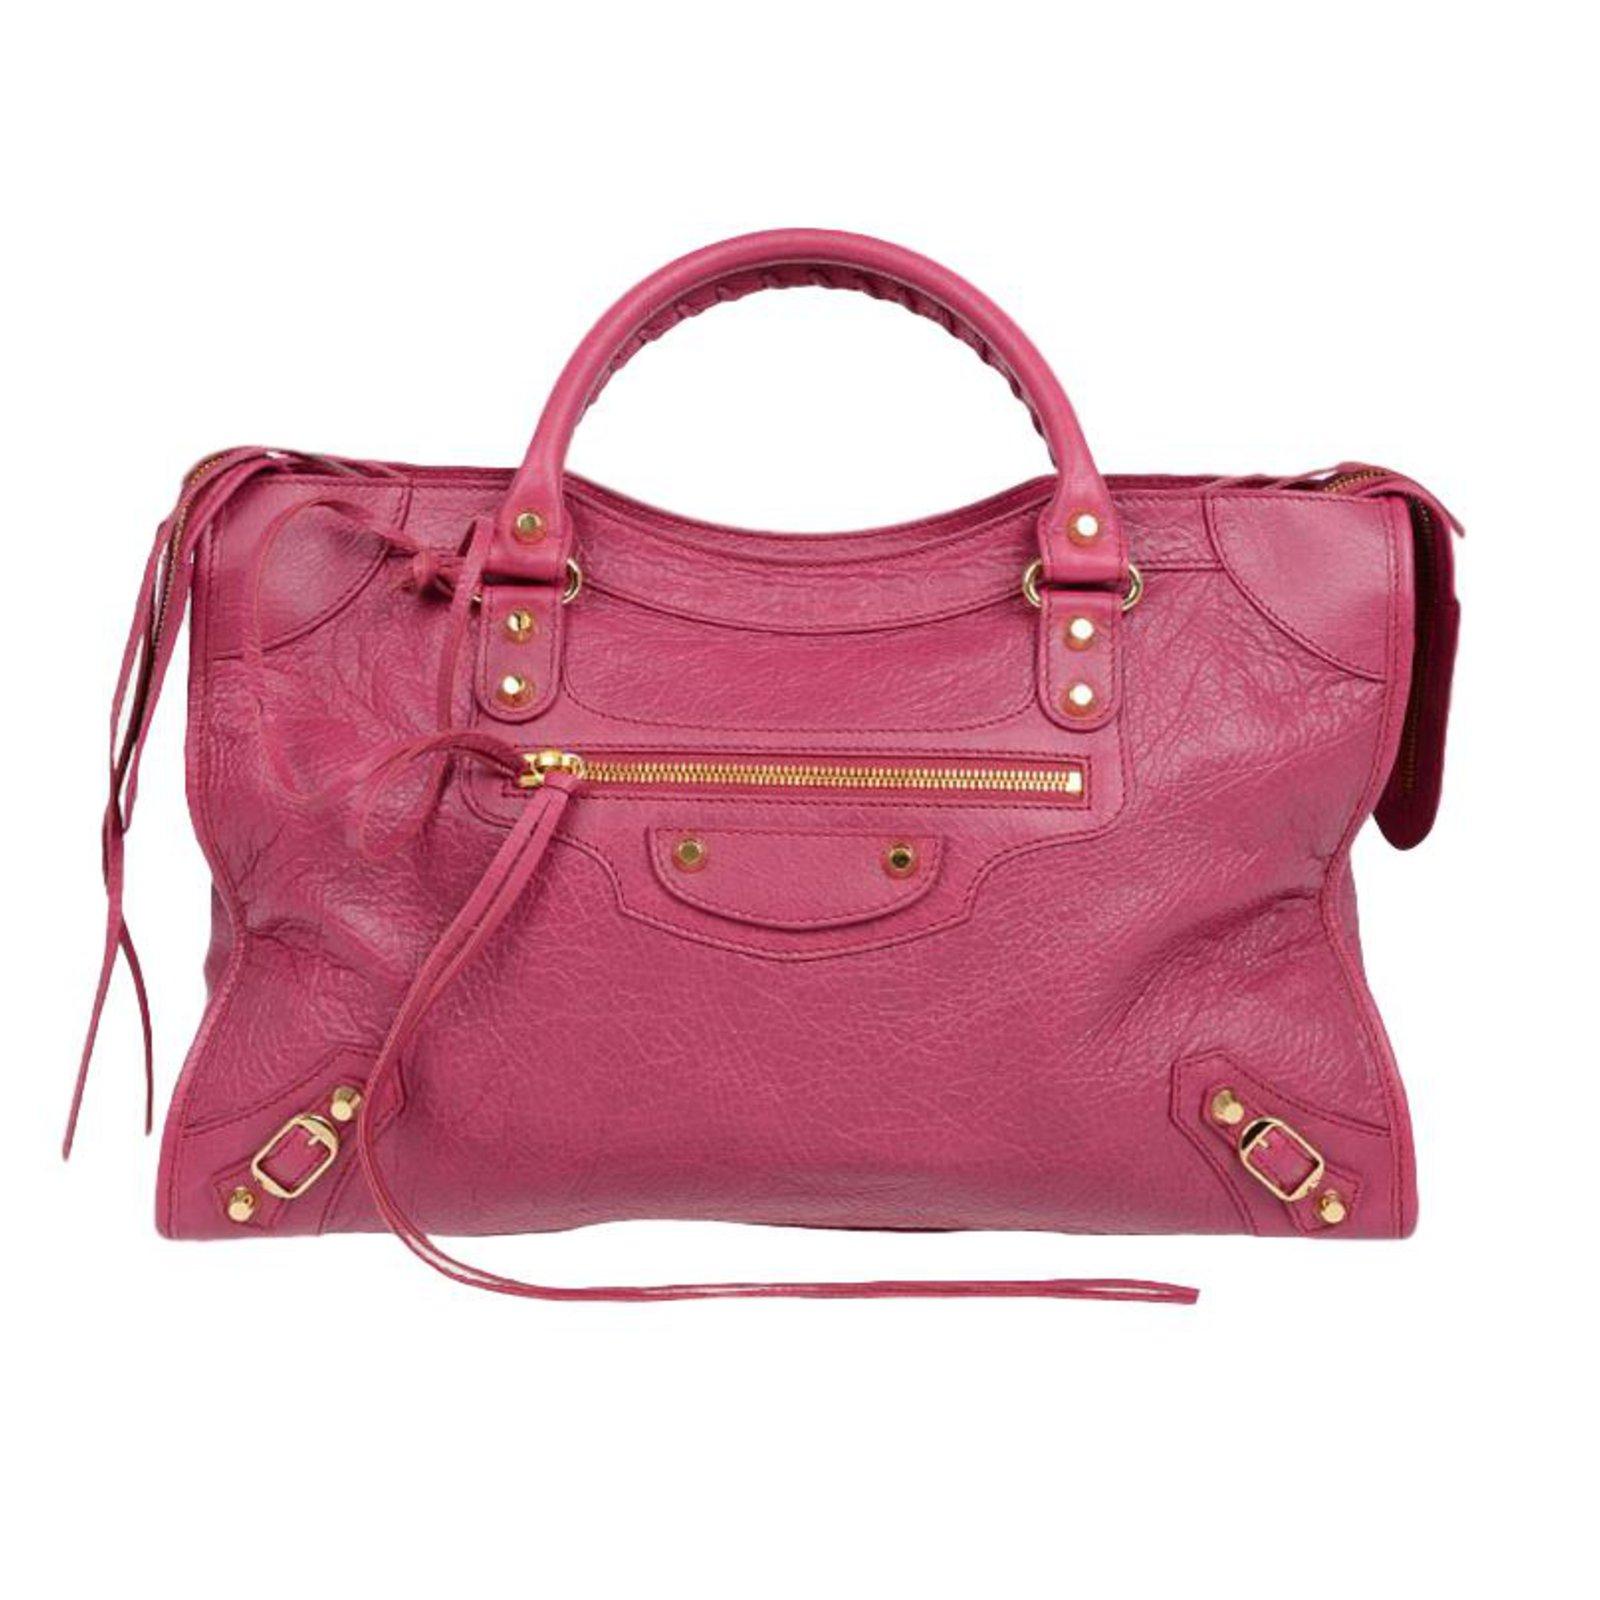 code promo 35d64 56b42 City bag